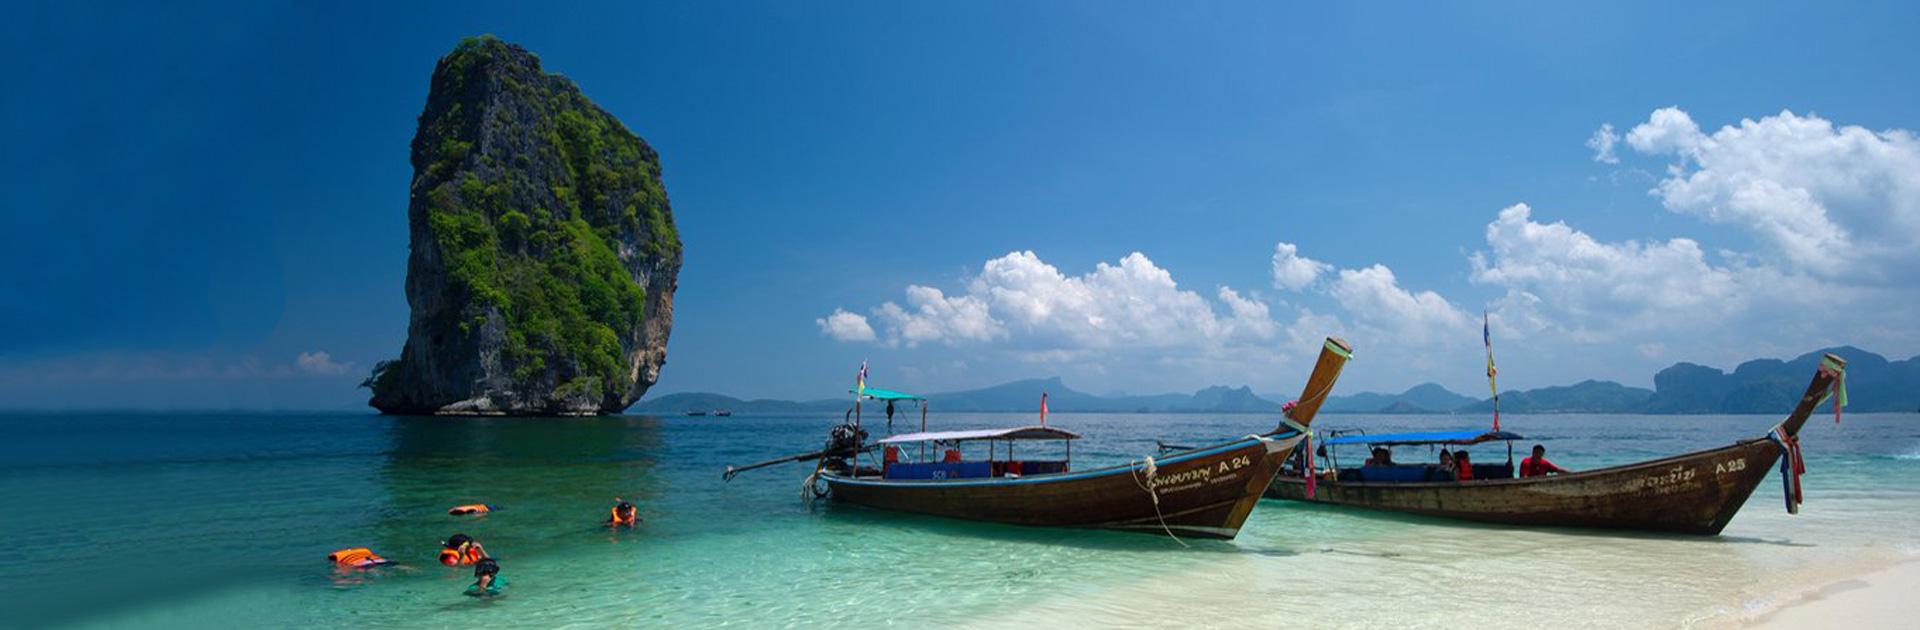 TH Bangkok y Krabi 10 días 1